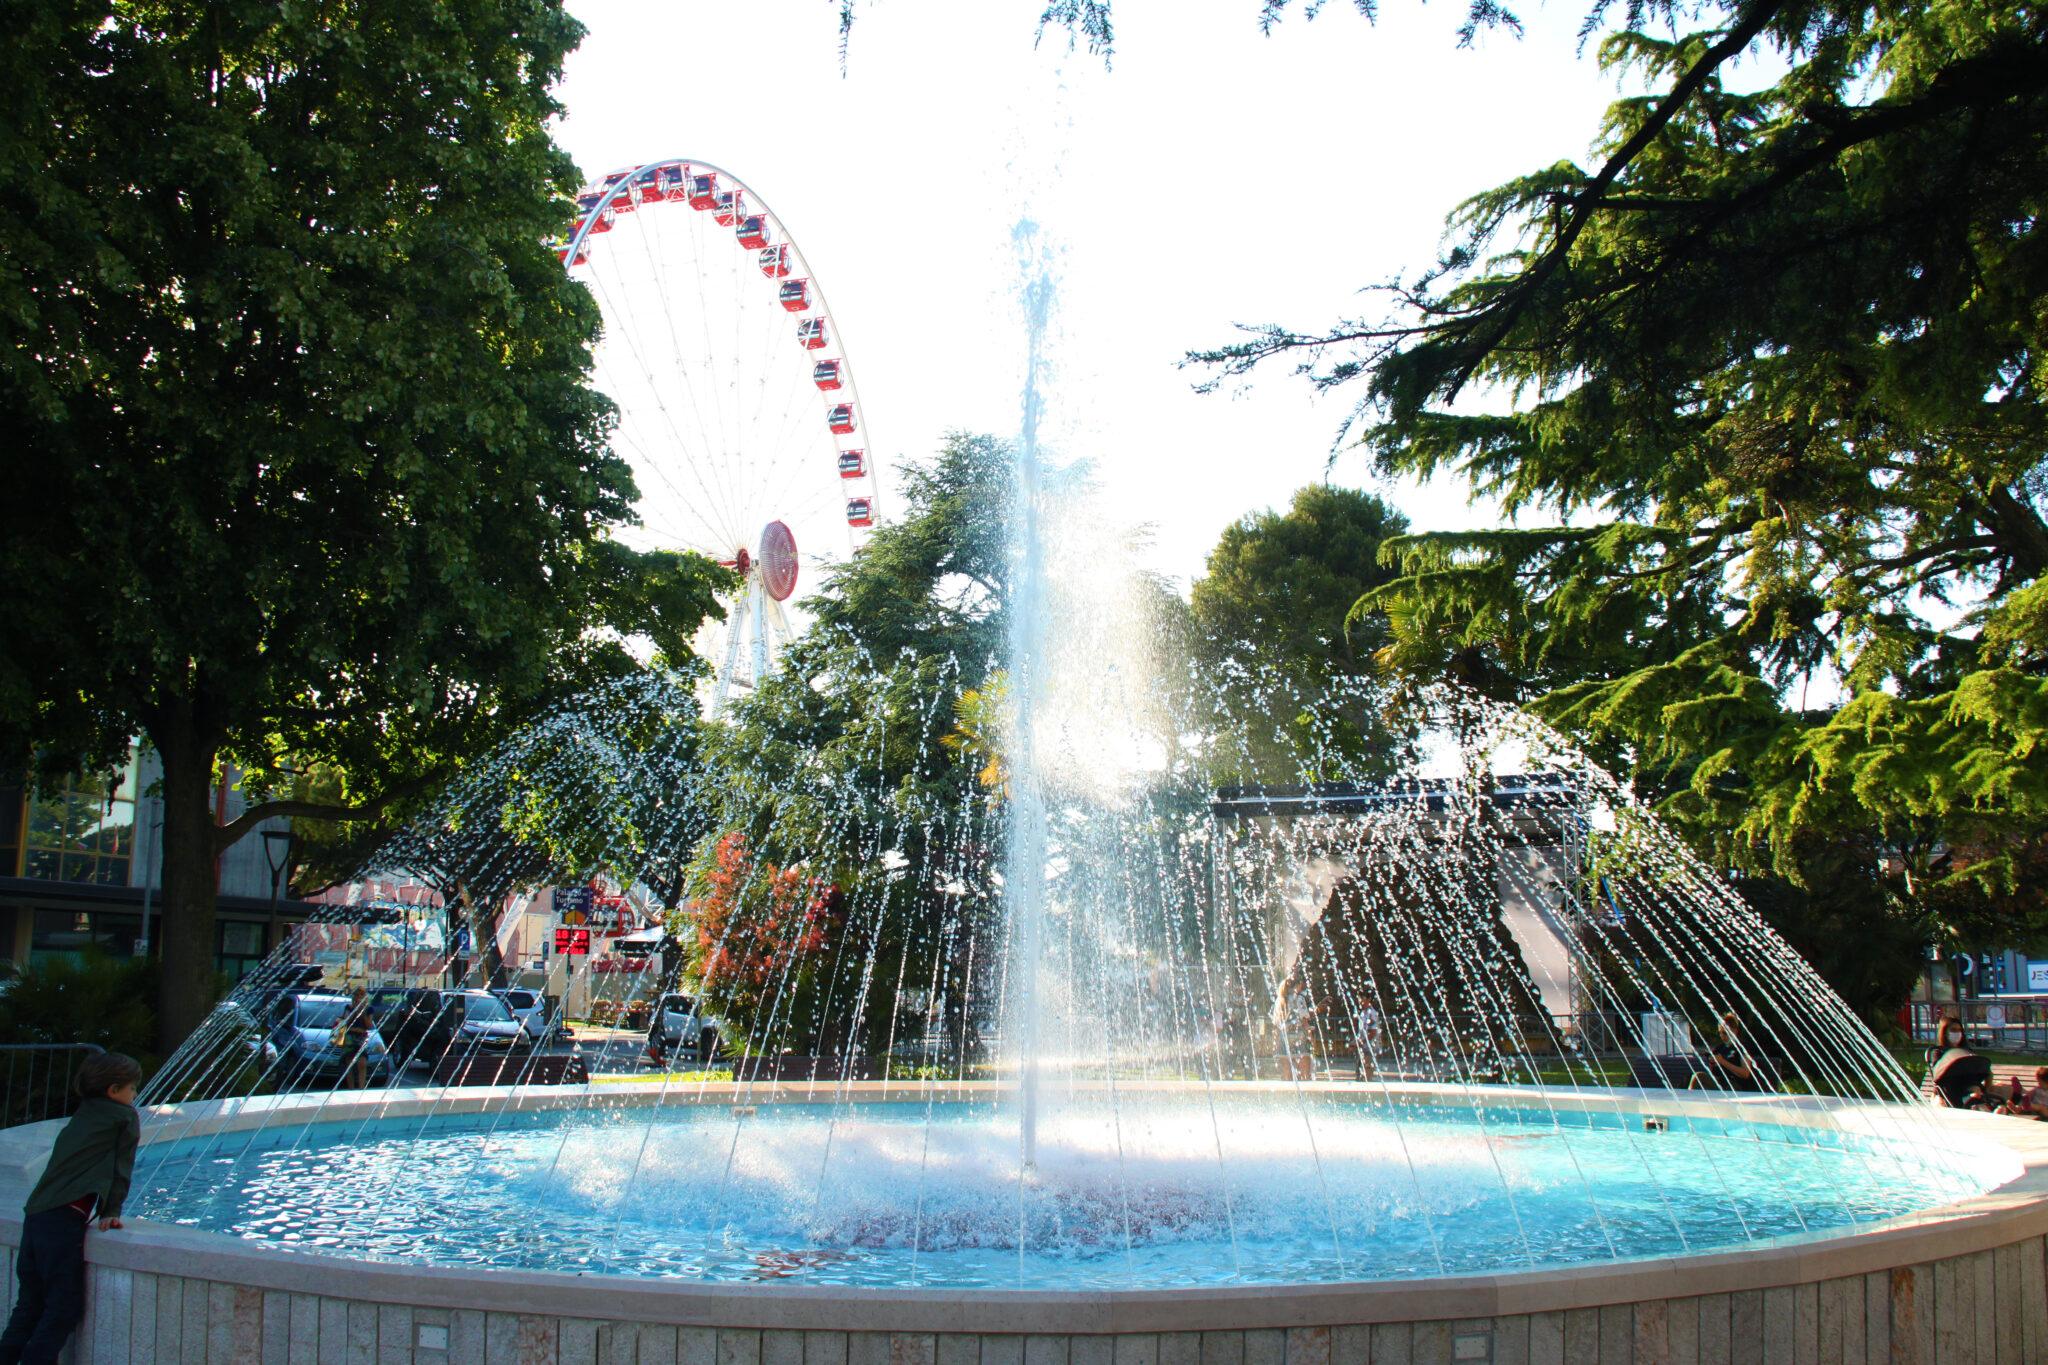 forme-dacqua_restauro-fontana-piazza-brescia-1-scaled